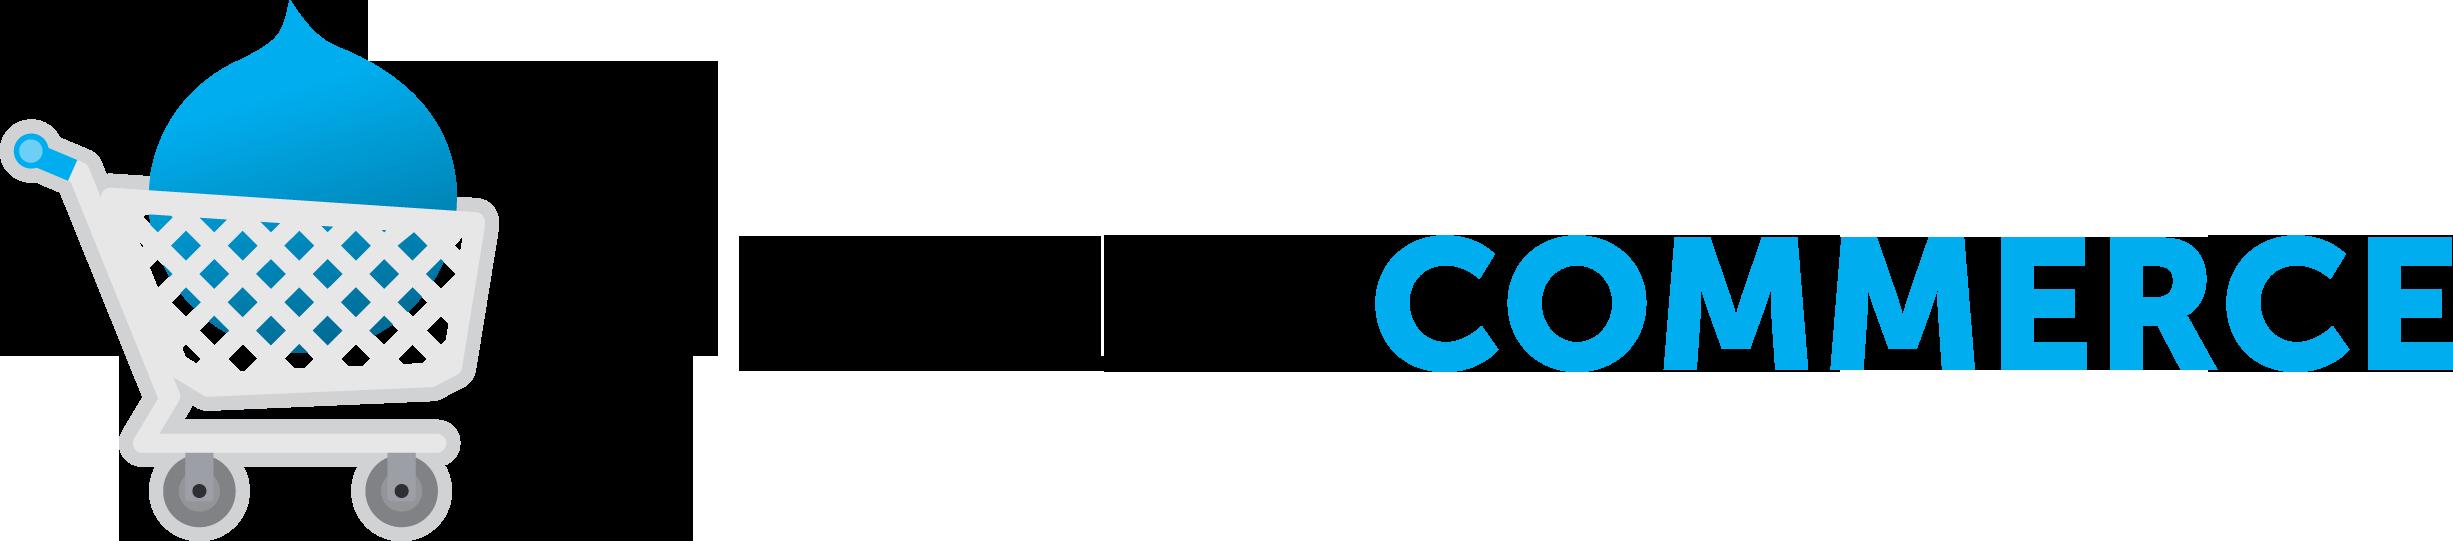 Drupal Commerce Technology Logo